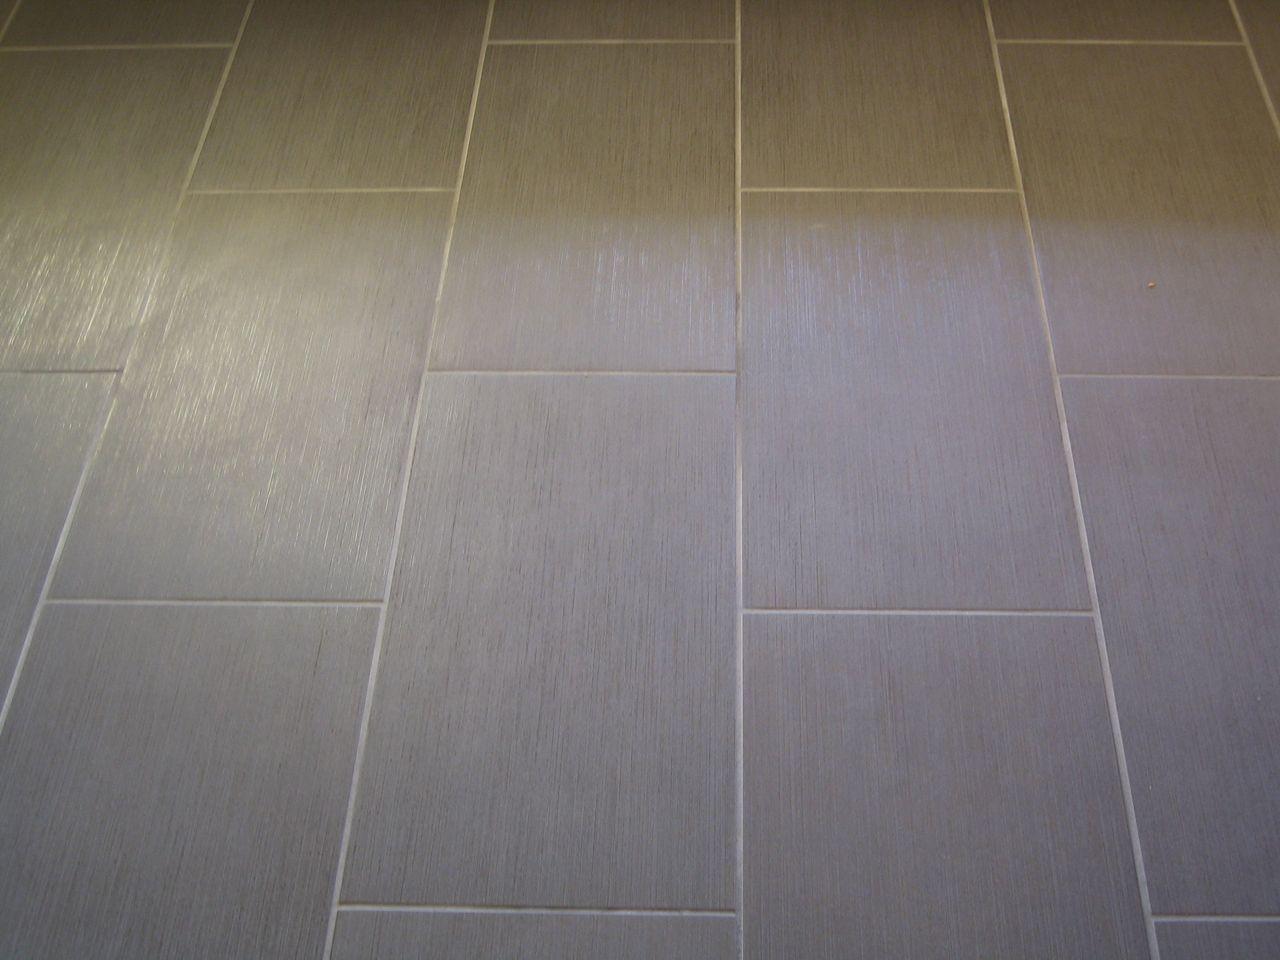 Gray Rectangle Floor Tile Choice Image Flooring Design Ideas